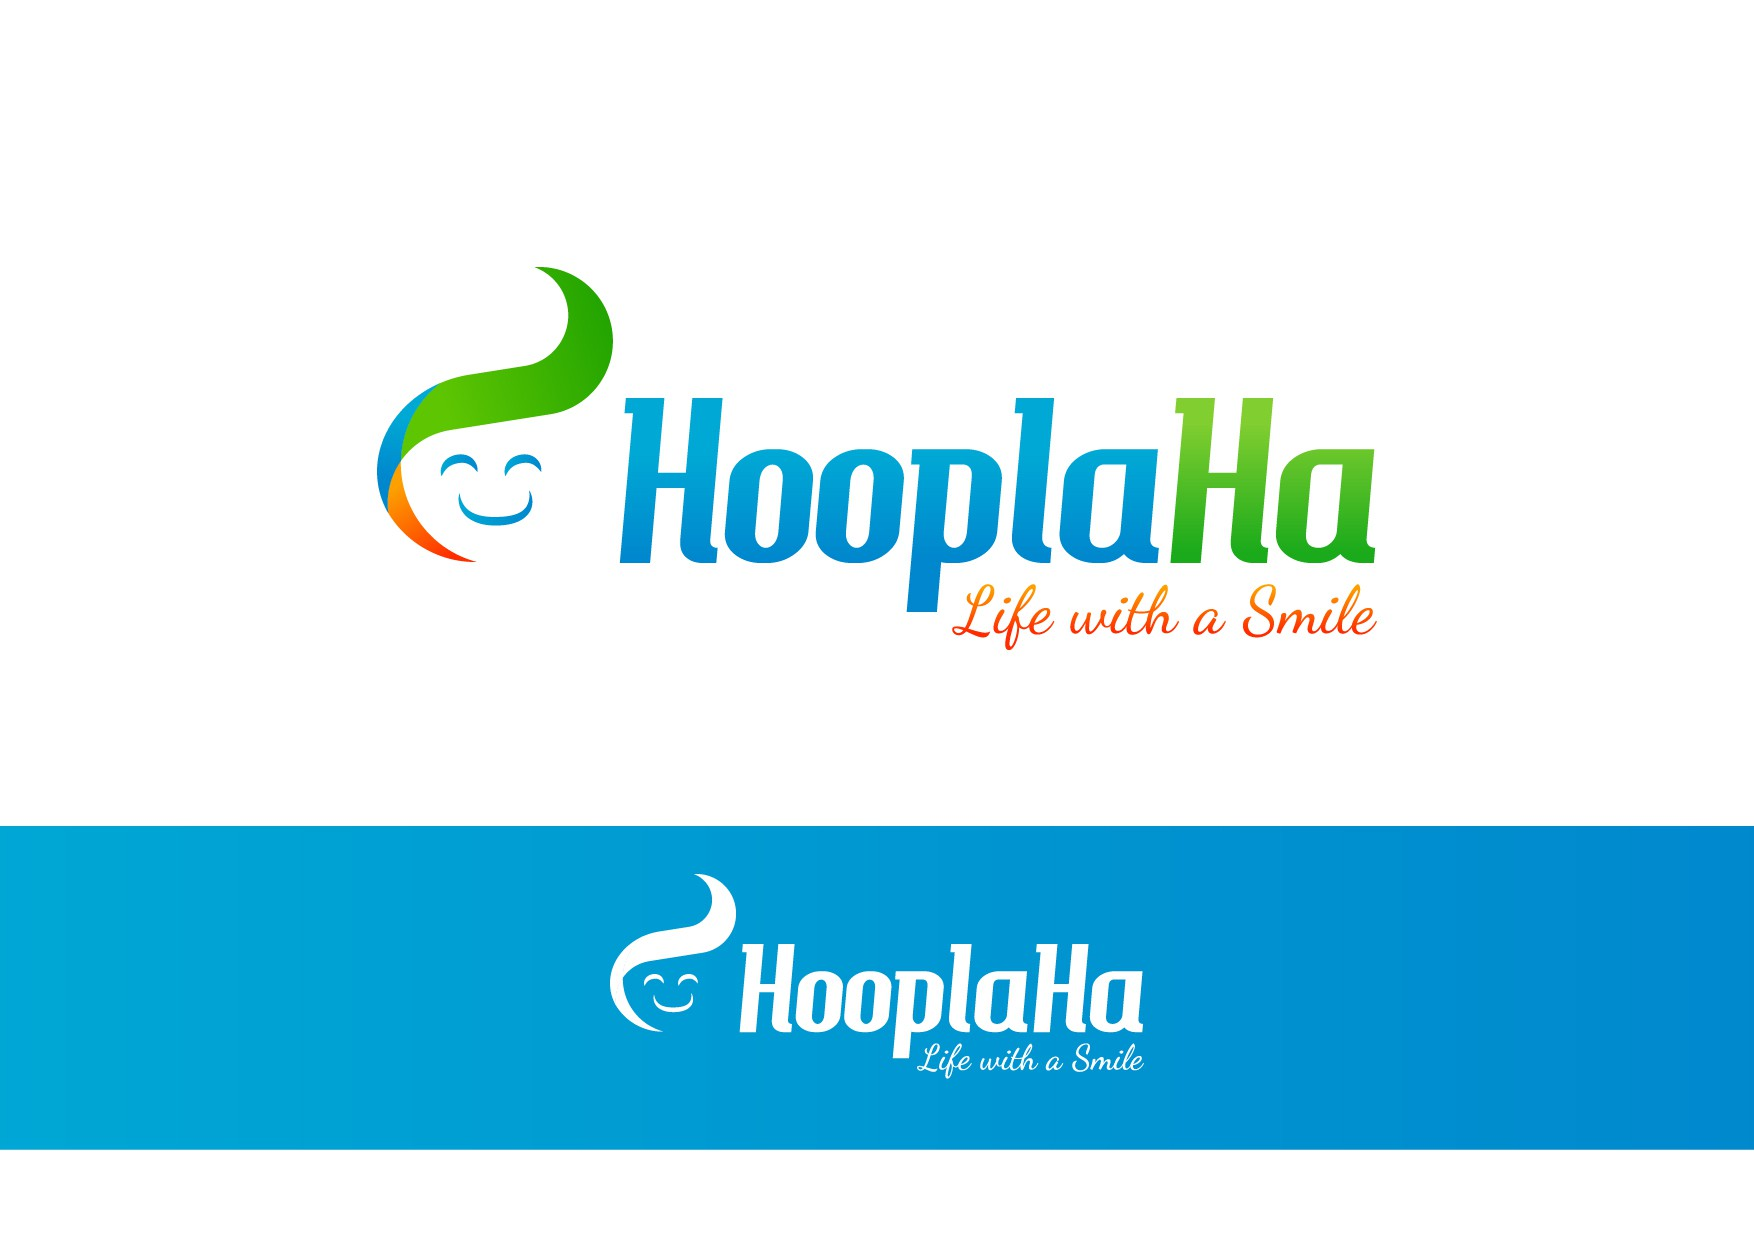 logo for HooplaHa